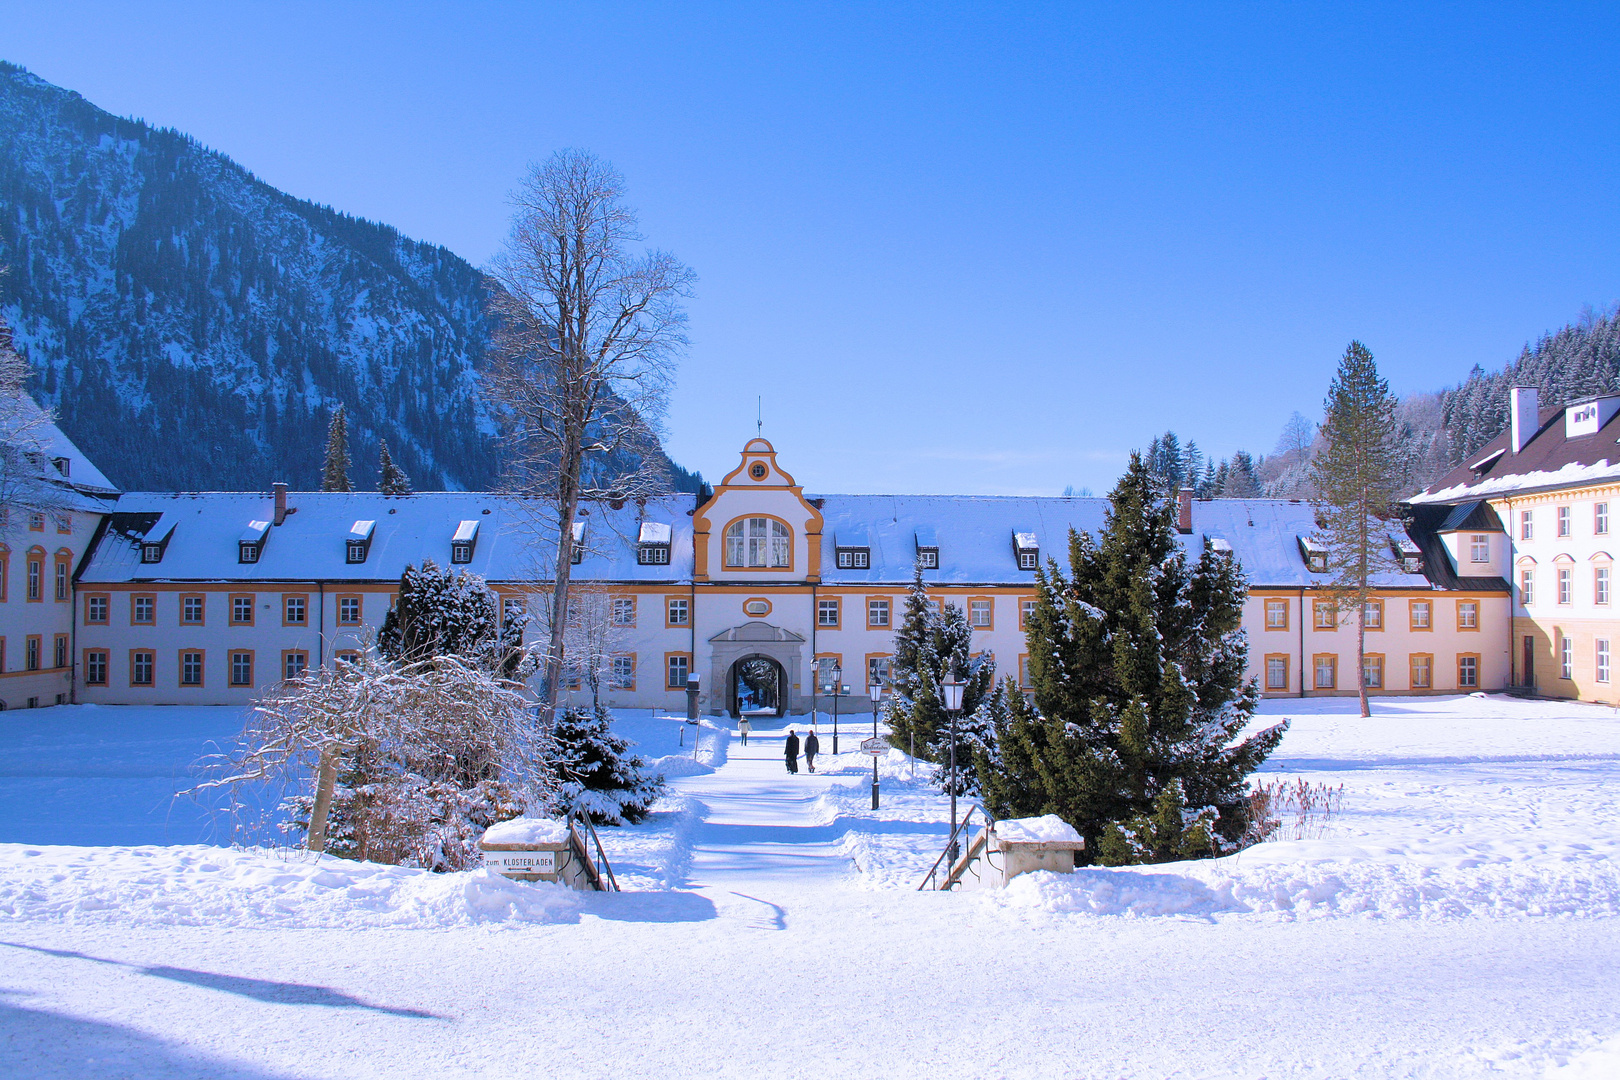 Kloster Oberammergu